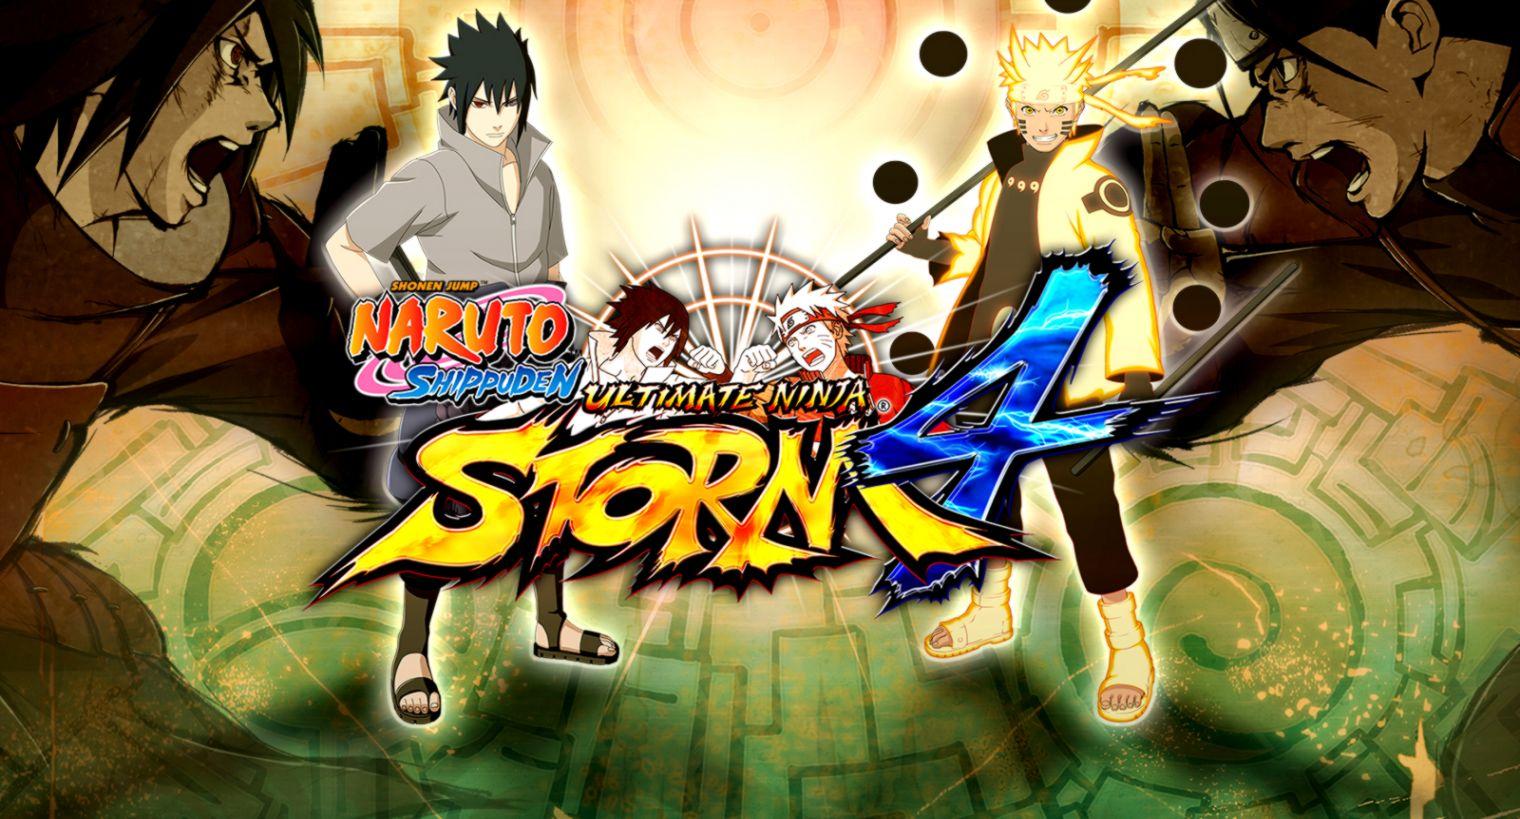 naruto shippuden ultimate ninja storm 4 road to boruto gameplay